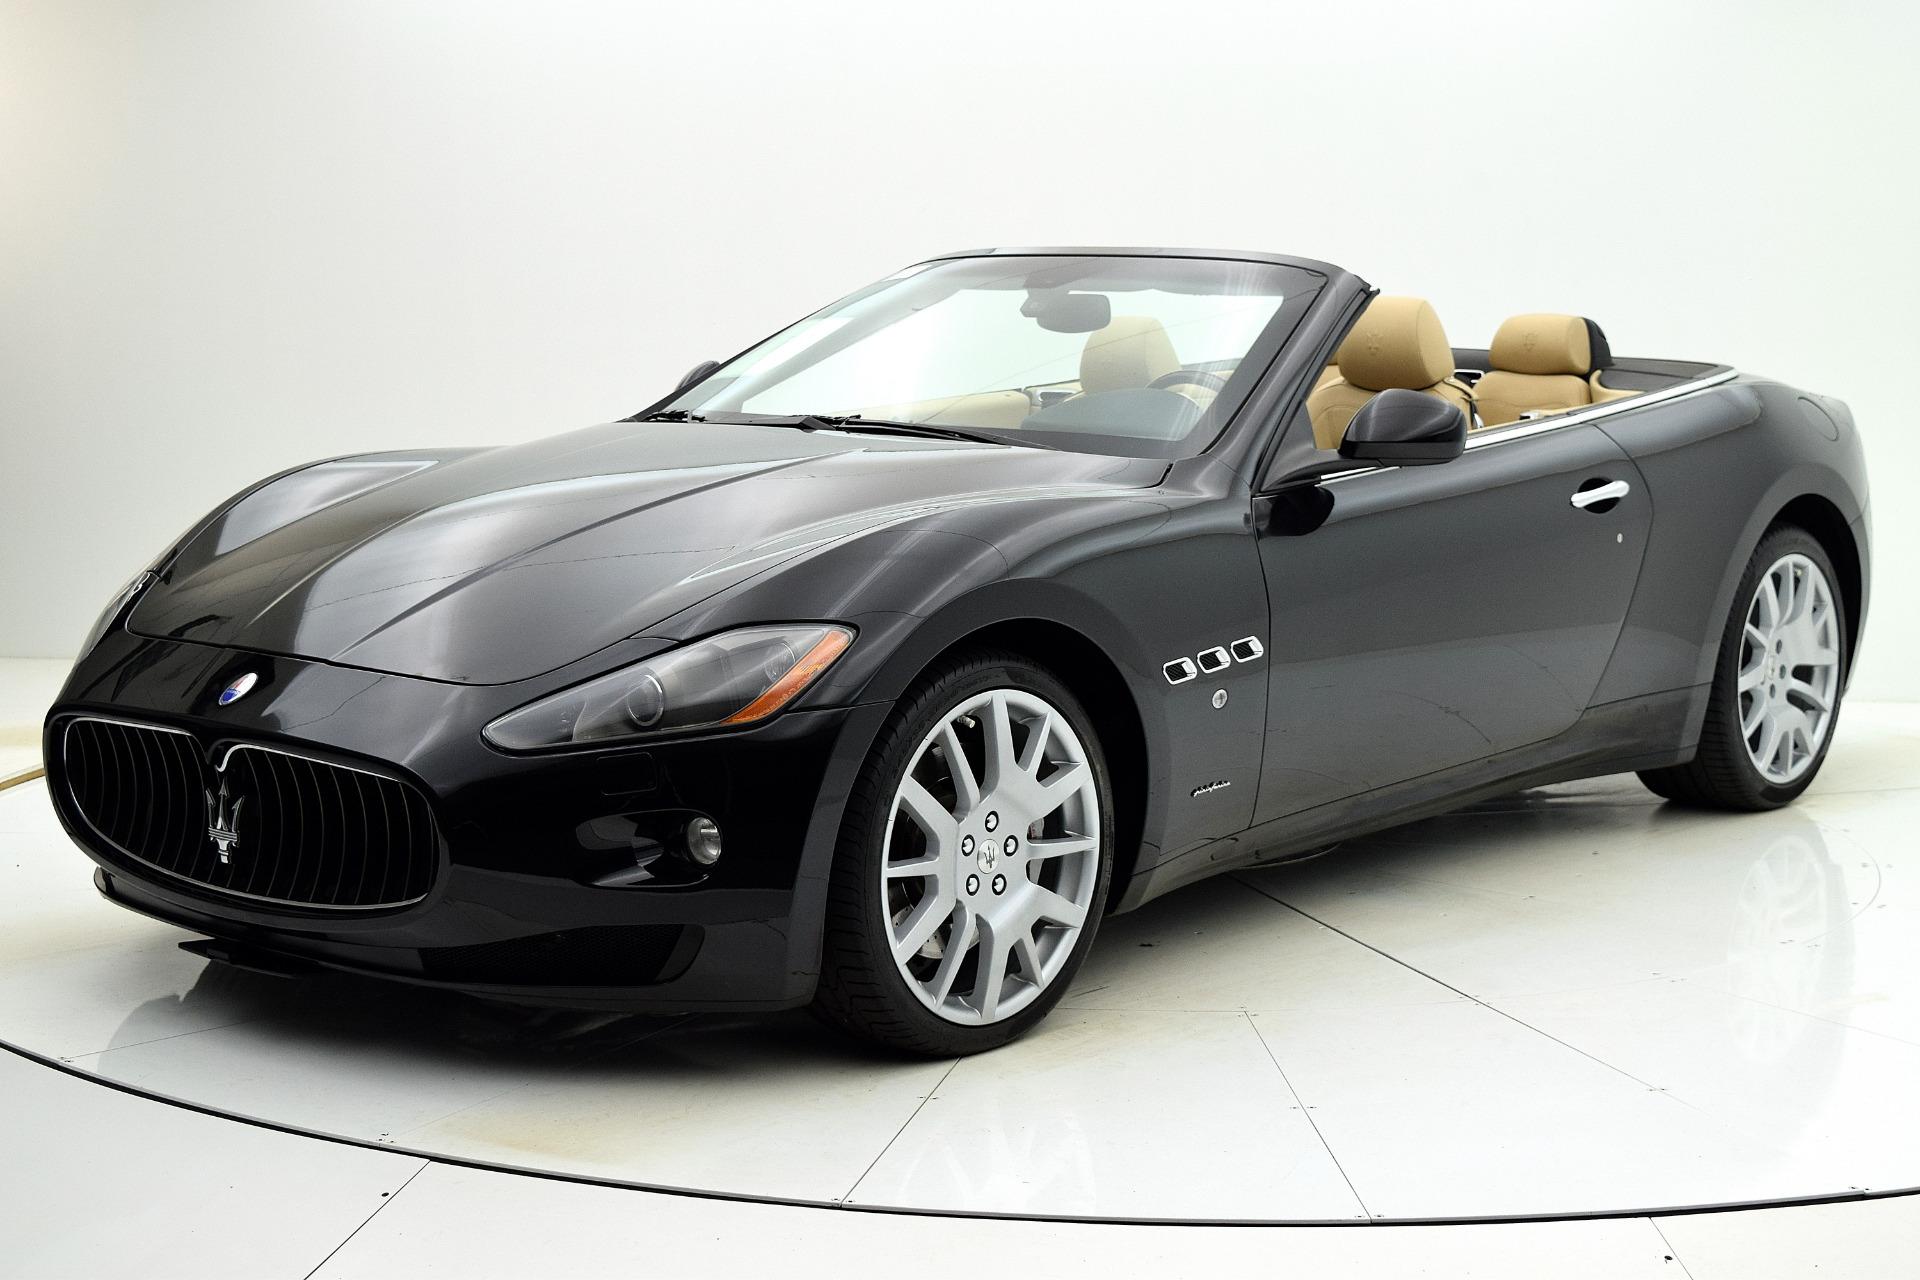 Used 2011 Maserati GranTurismo Convertible for sale $57,880 at Bentley Palmyra N.J. in Palmyra NJ 08065 2